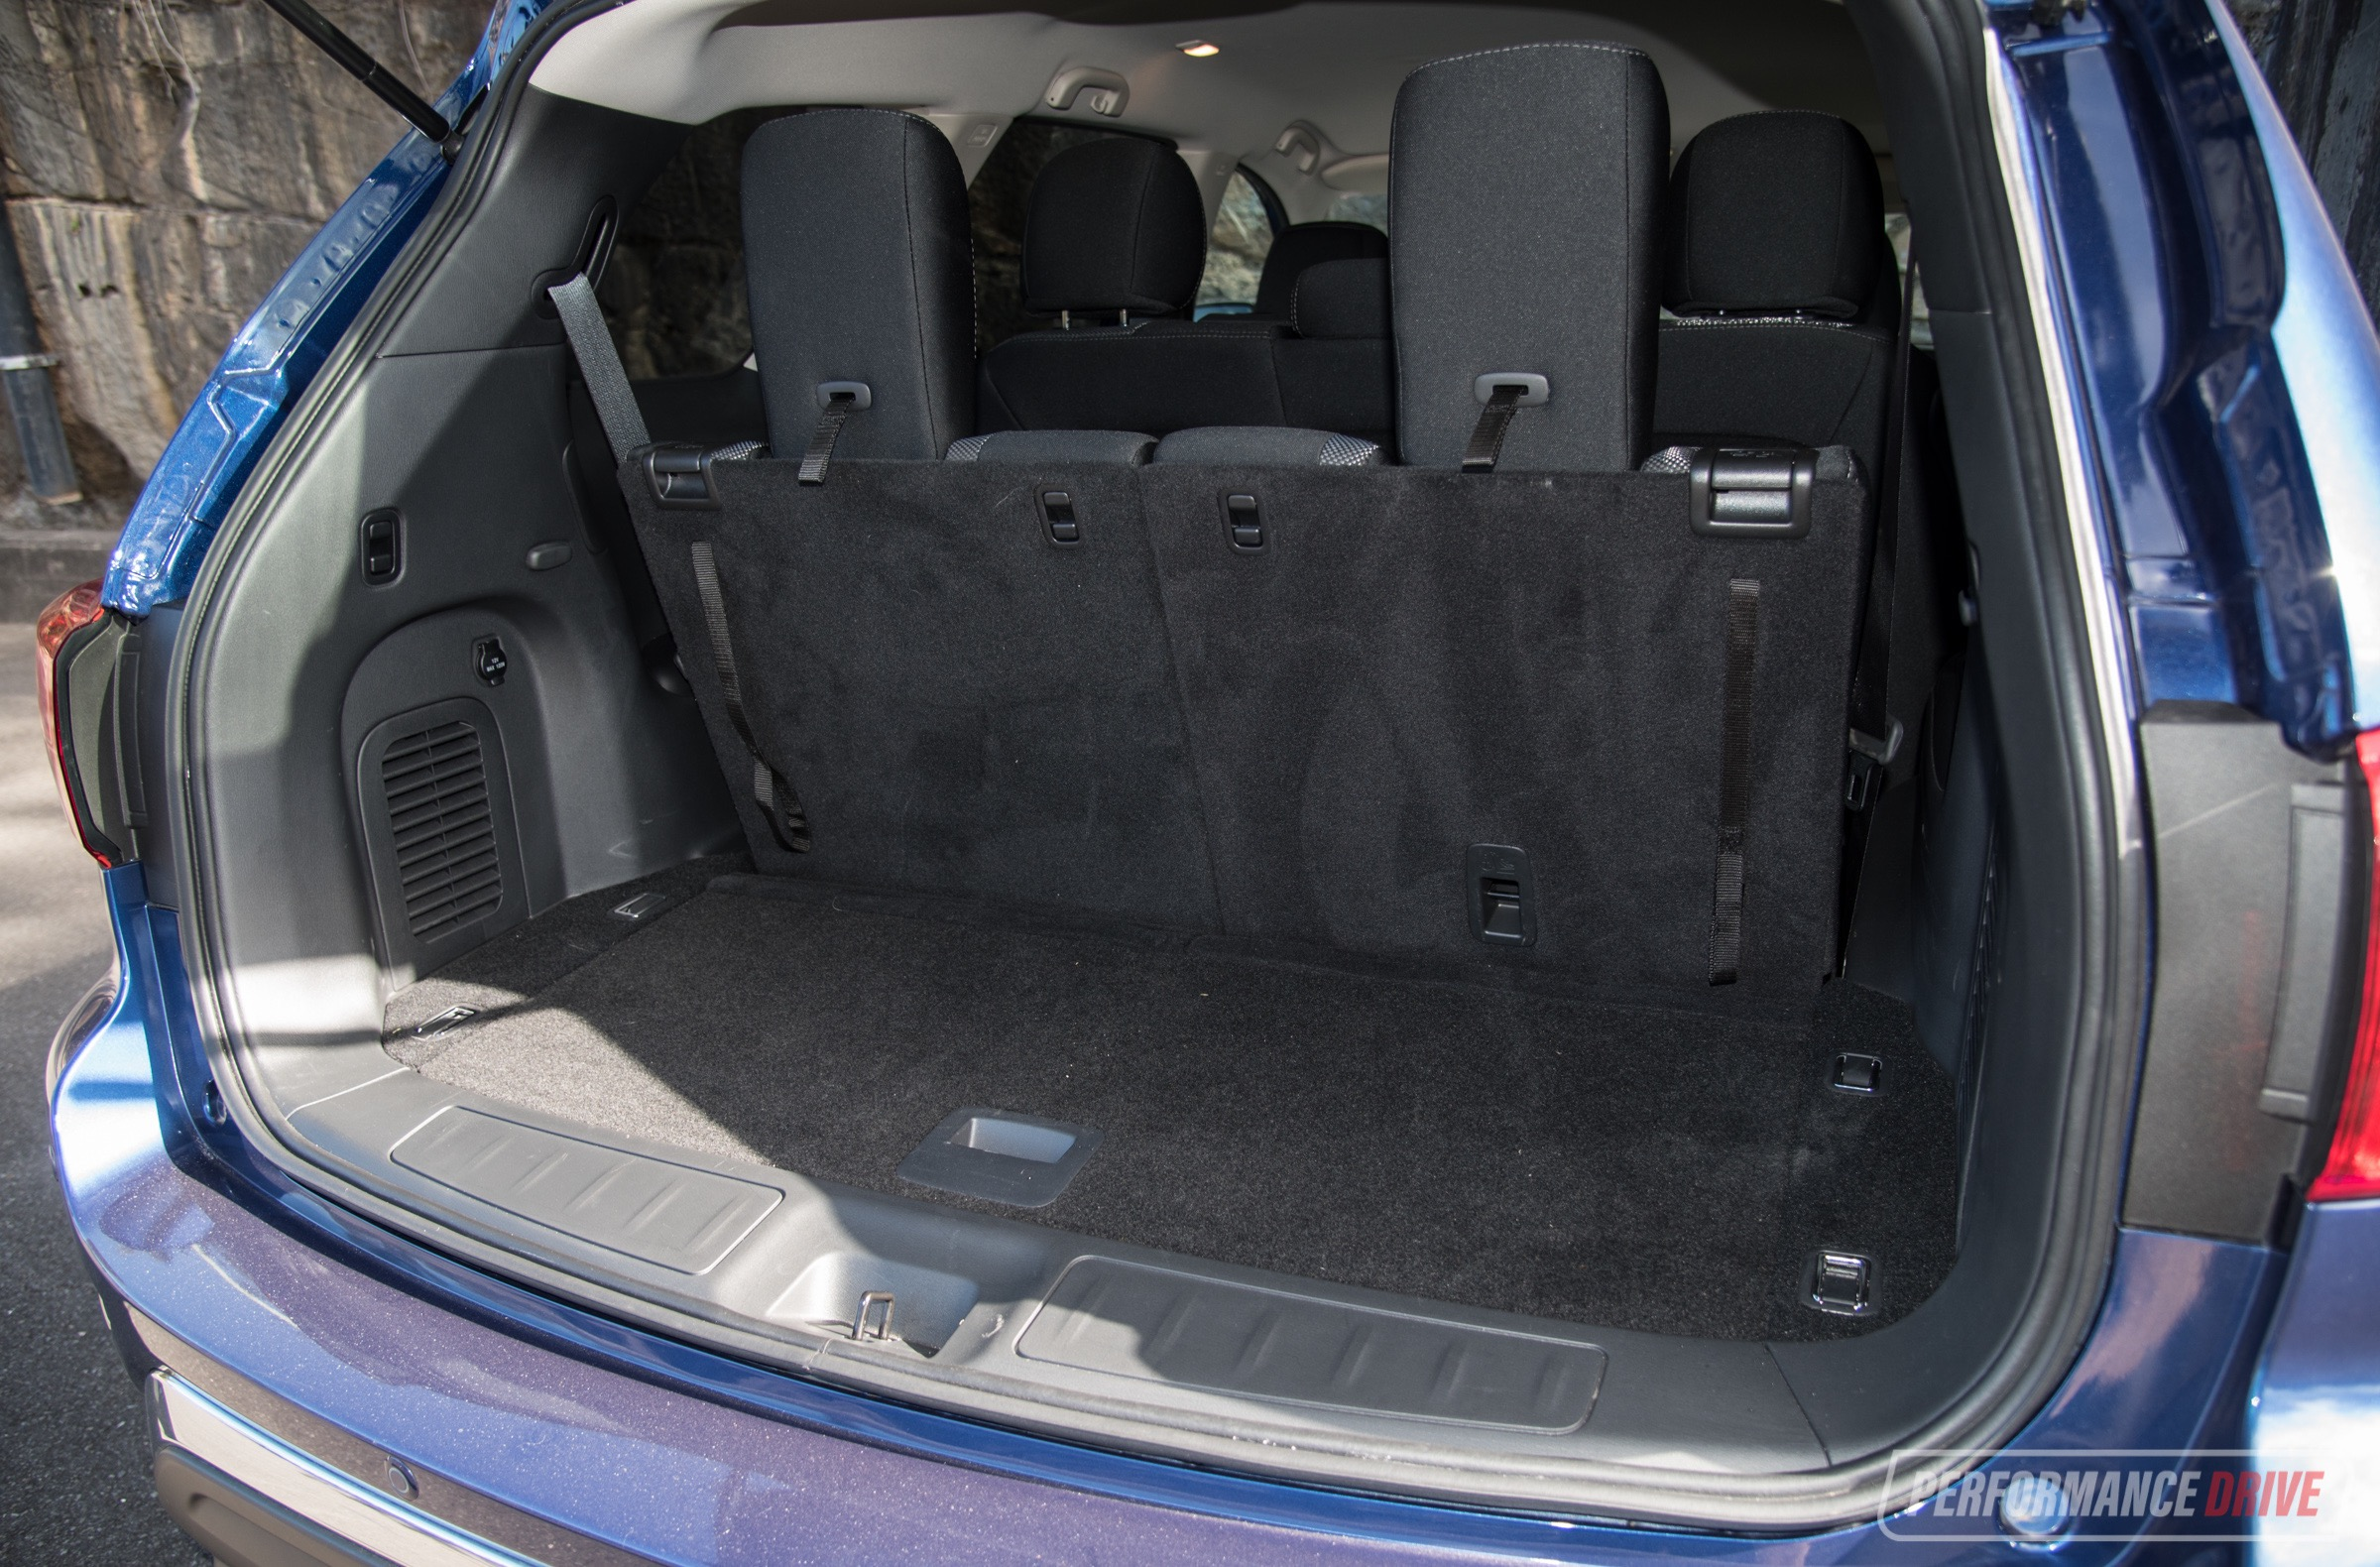 Range Rover Vs Land Rover >> 2018 Nissan Pathfinder ST-min cargo space